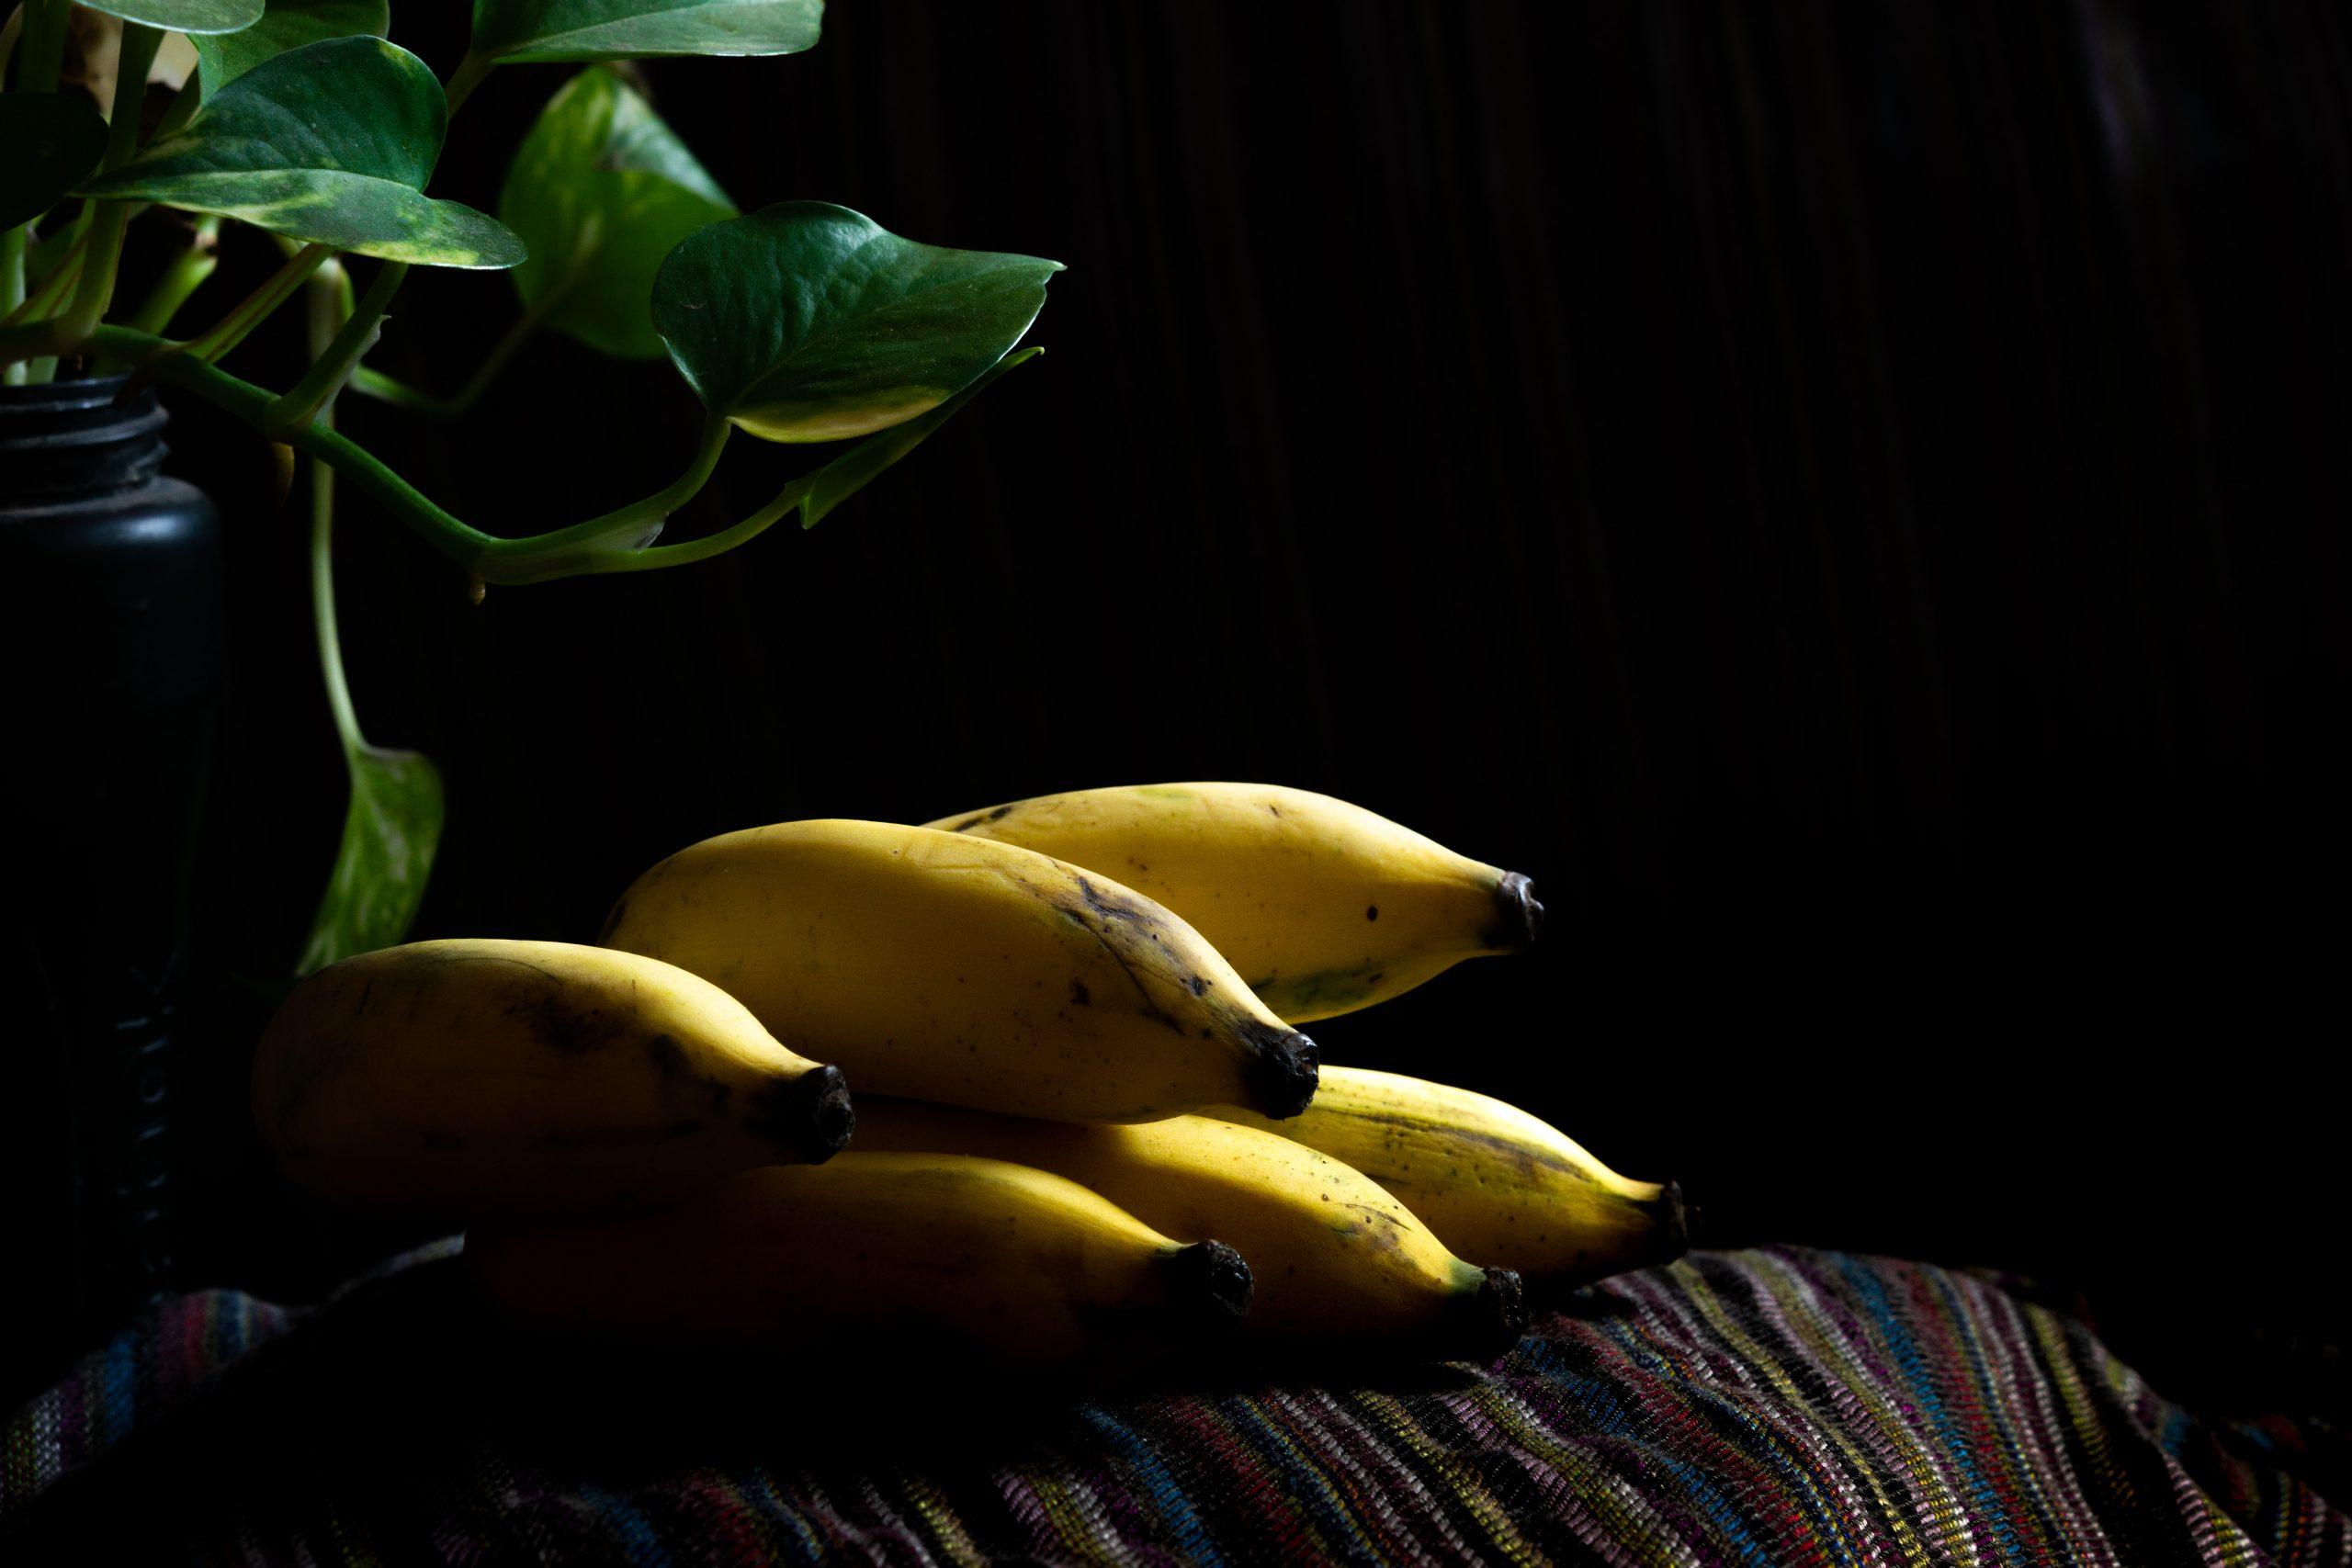 A bananas cluster